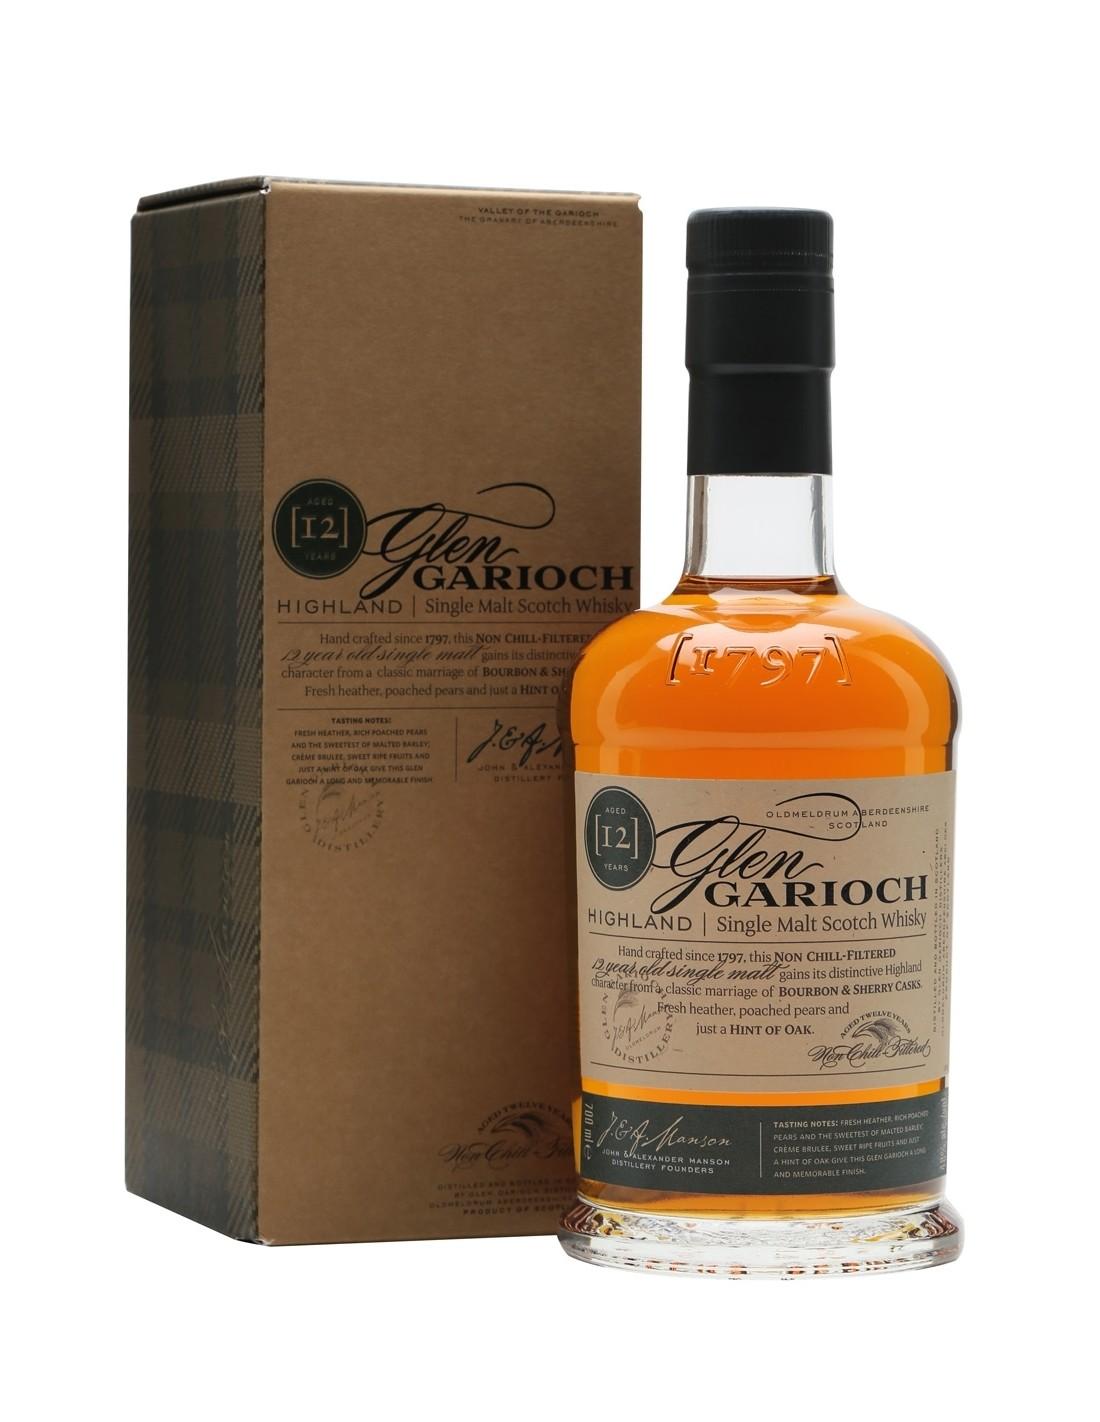 Whisky Glen Garioch, 12 ani, 48% alc., 1L, Scotia